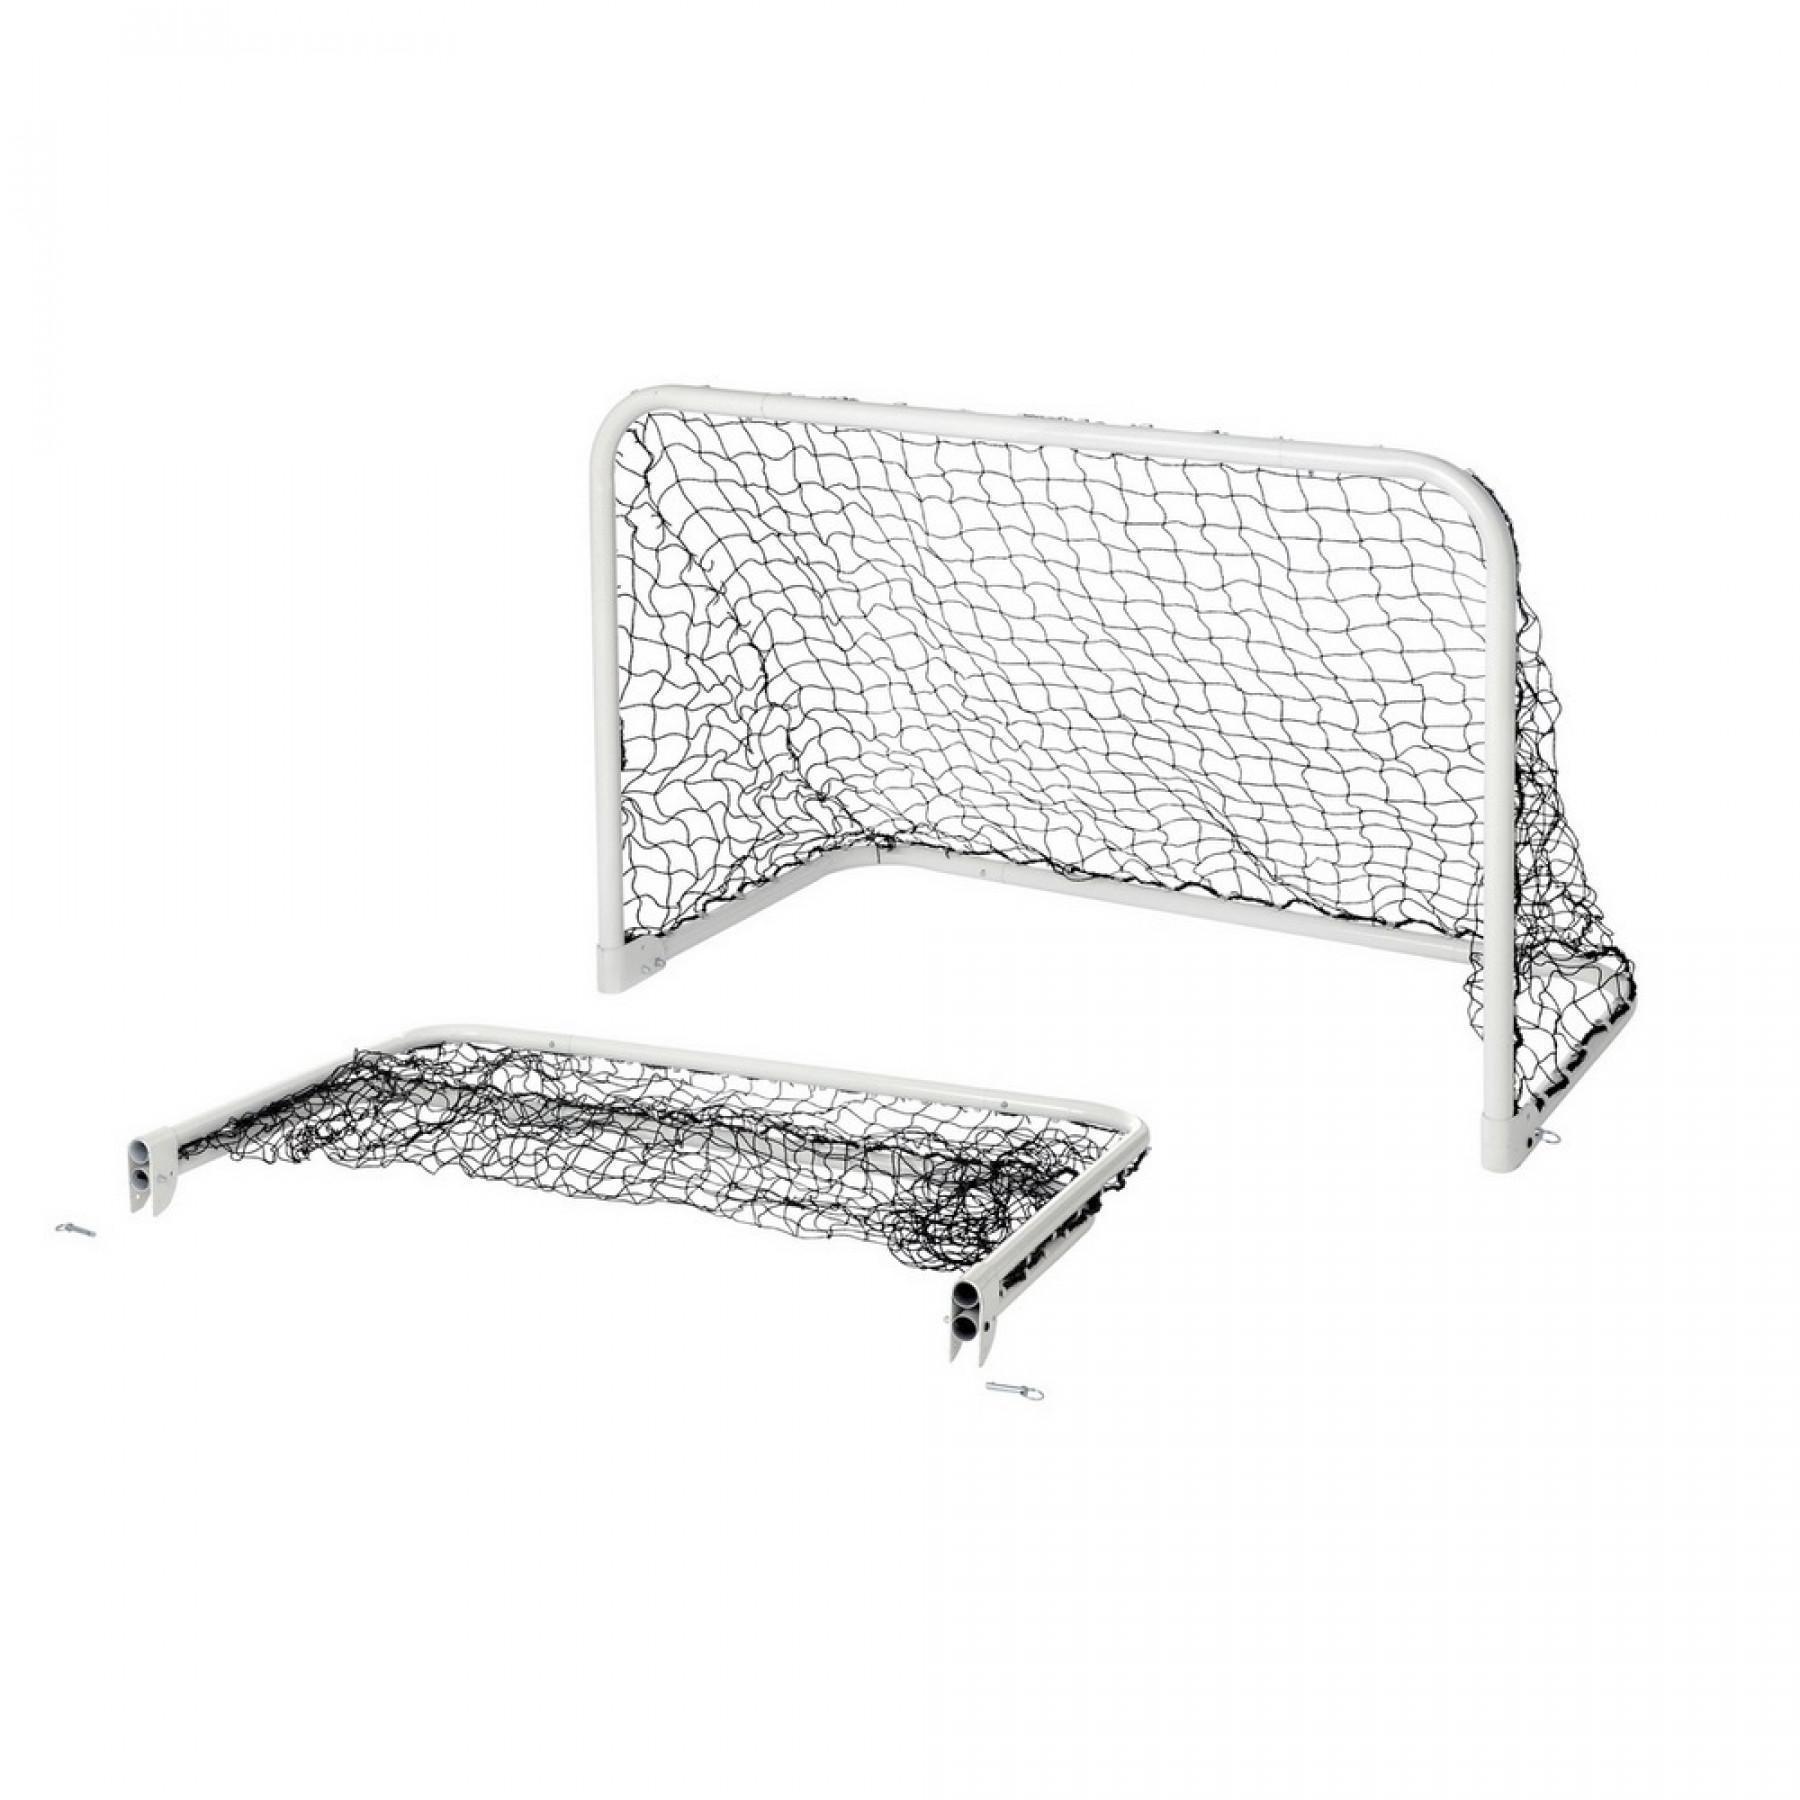 Mini folding football cage - 120 x 80 x 60 cm